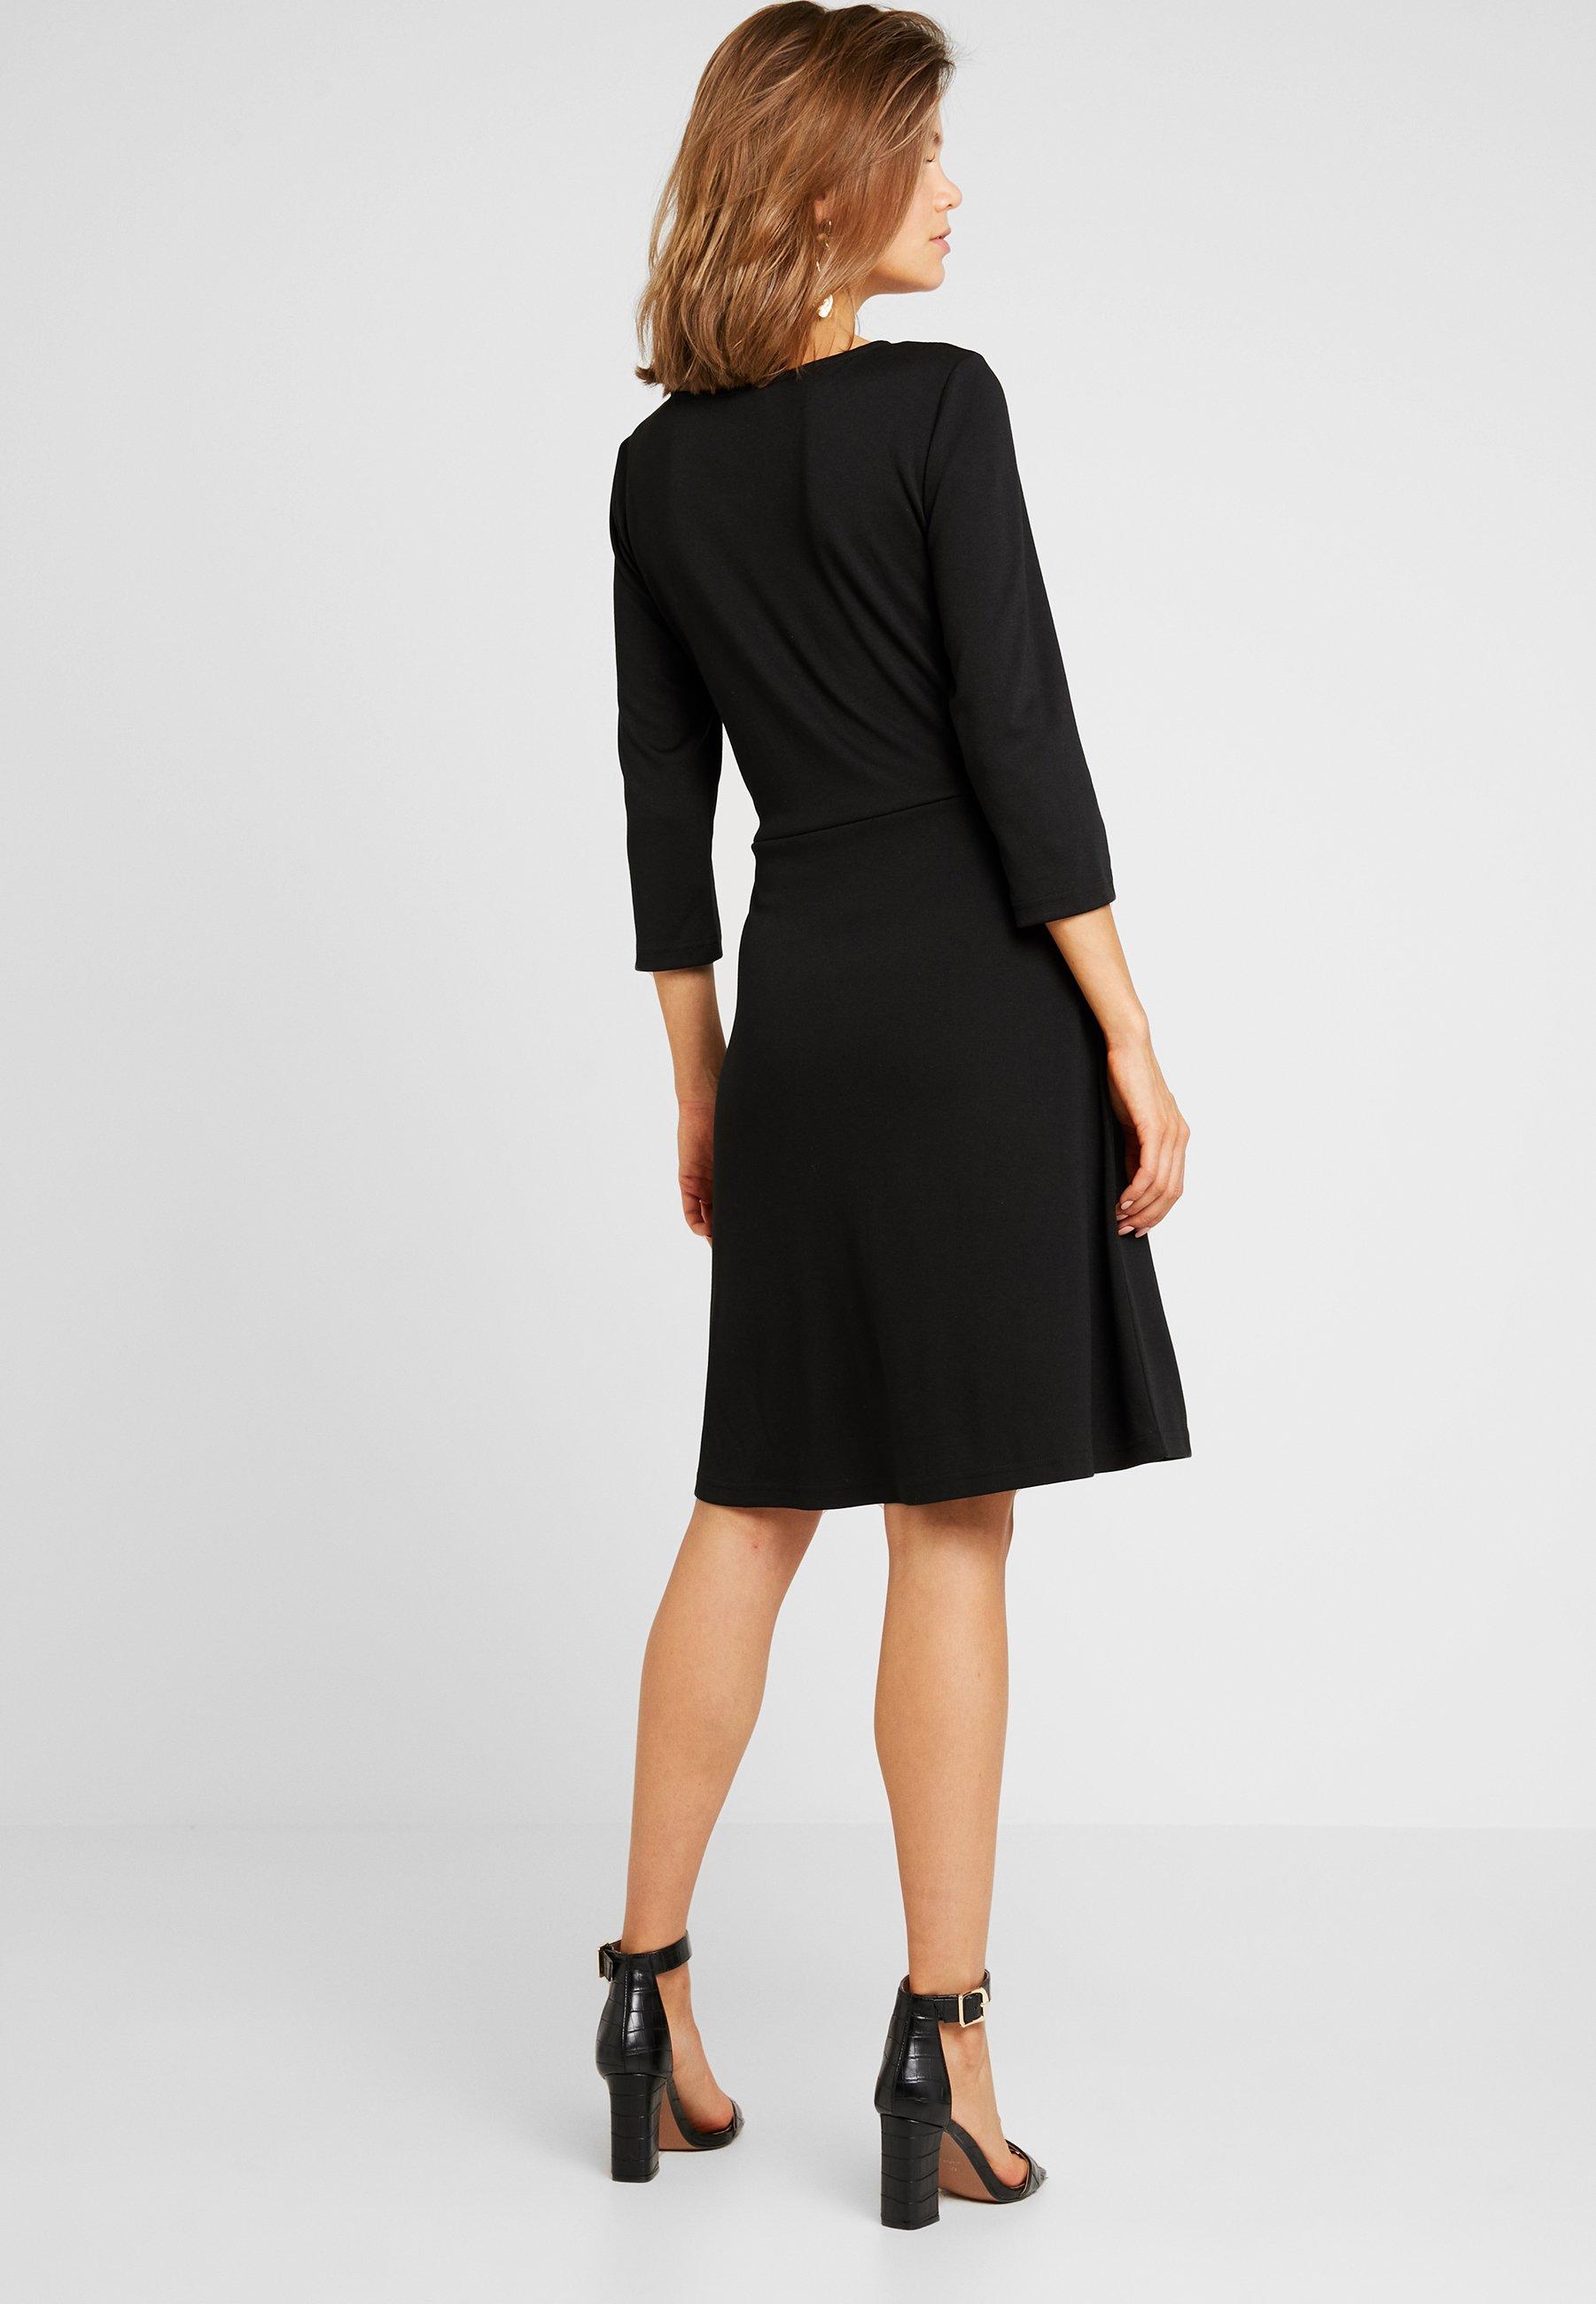 Doll 3 Jersey Vila 4 En DressRobe Black Vitinny Sleeve N0m8nw